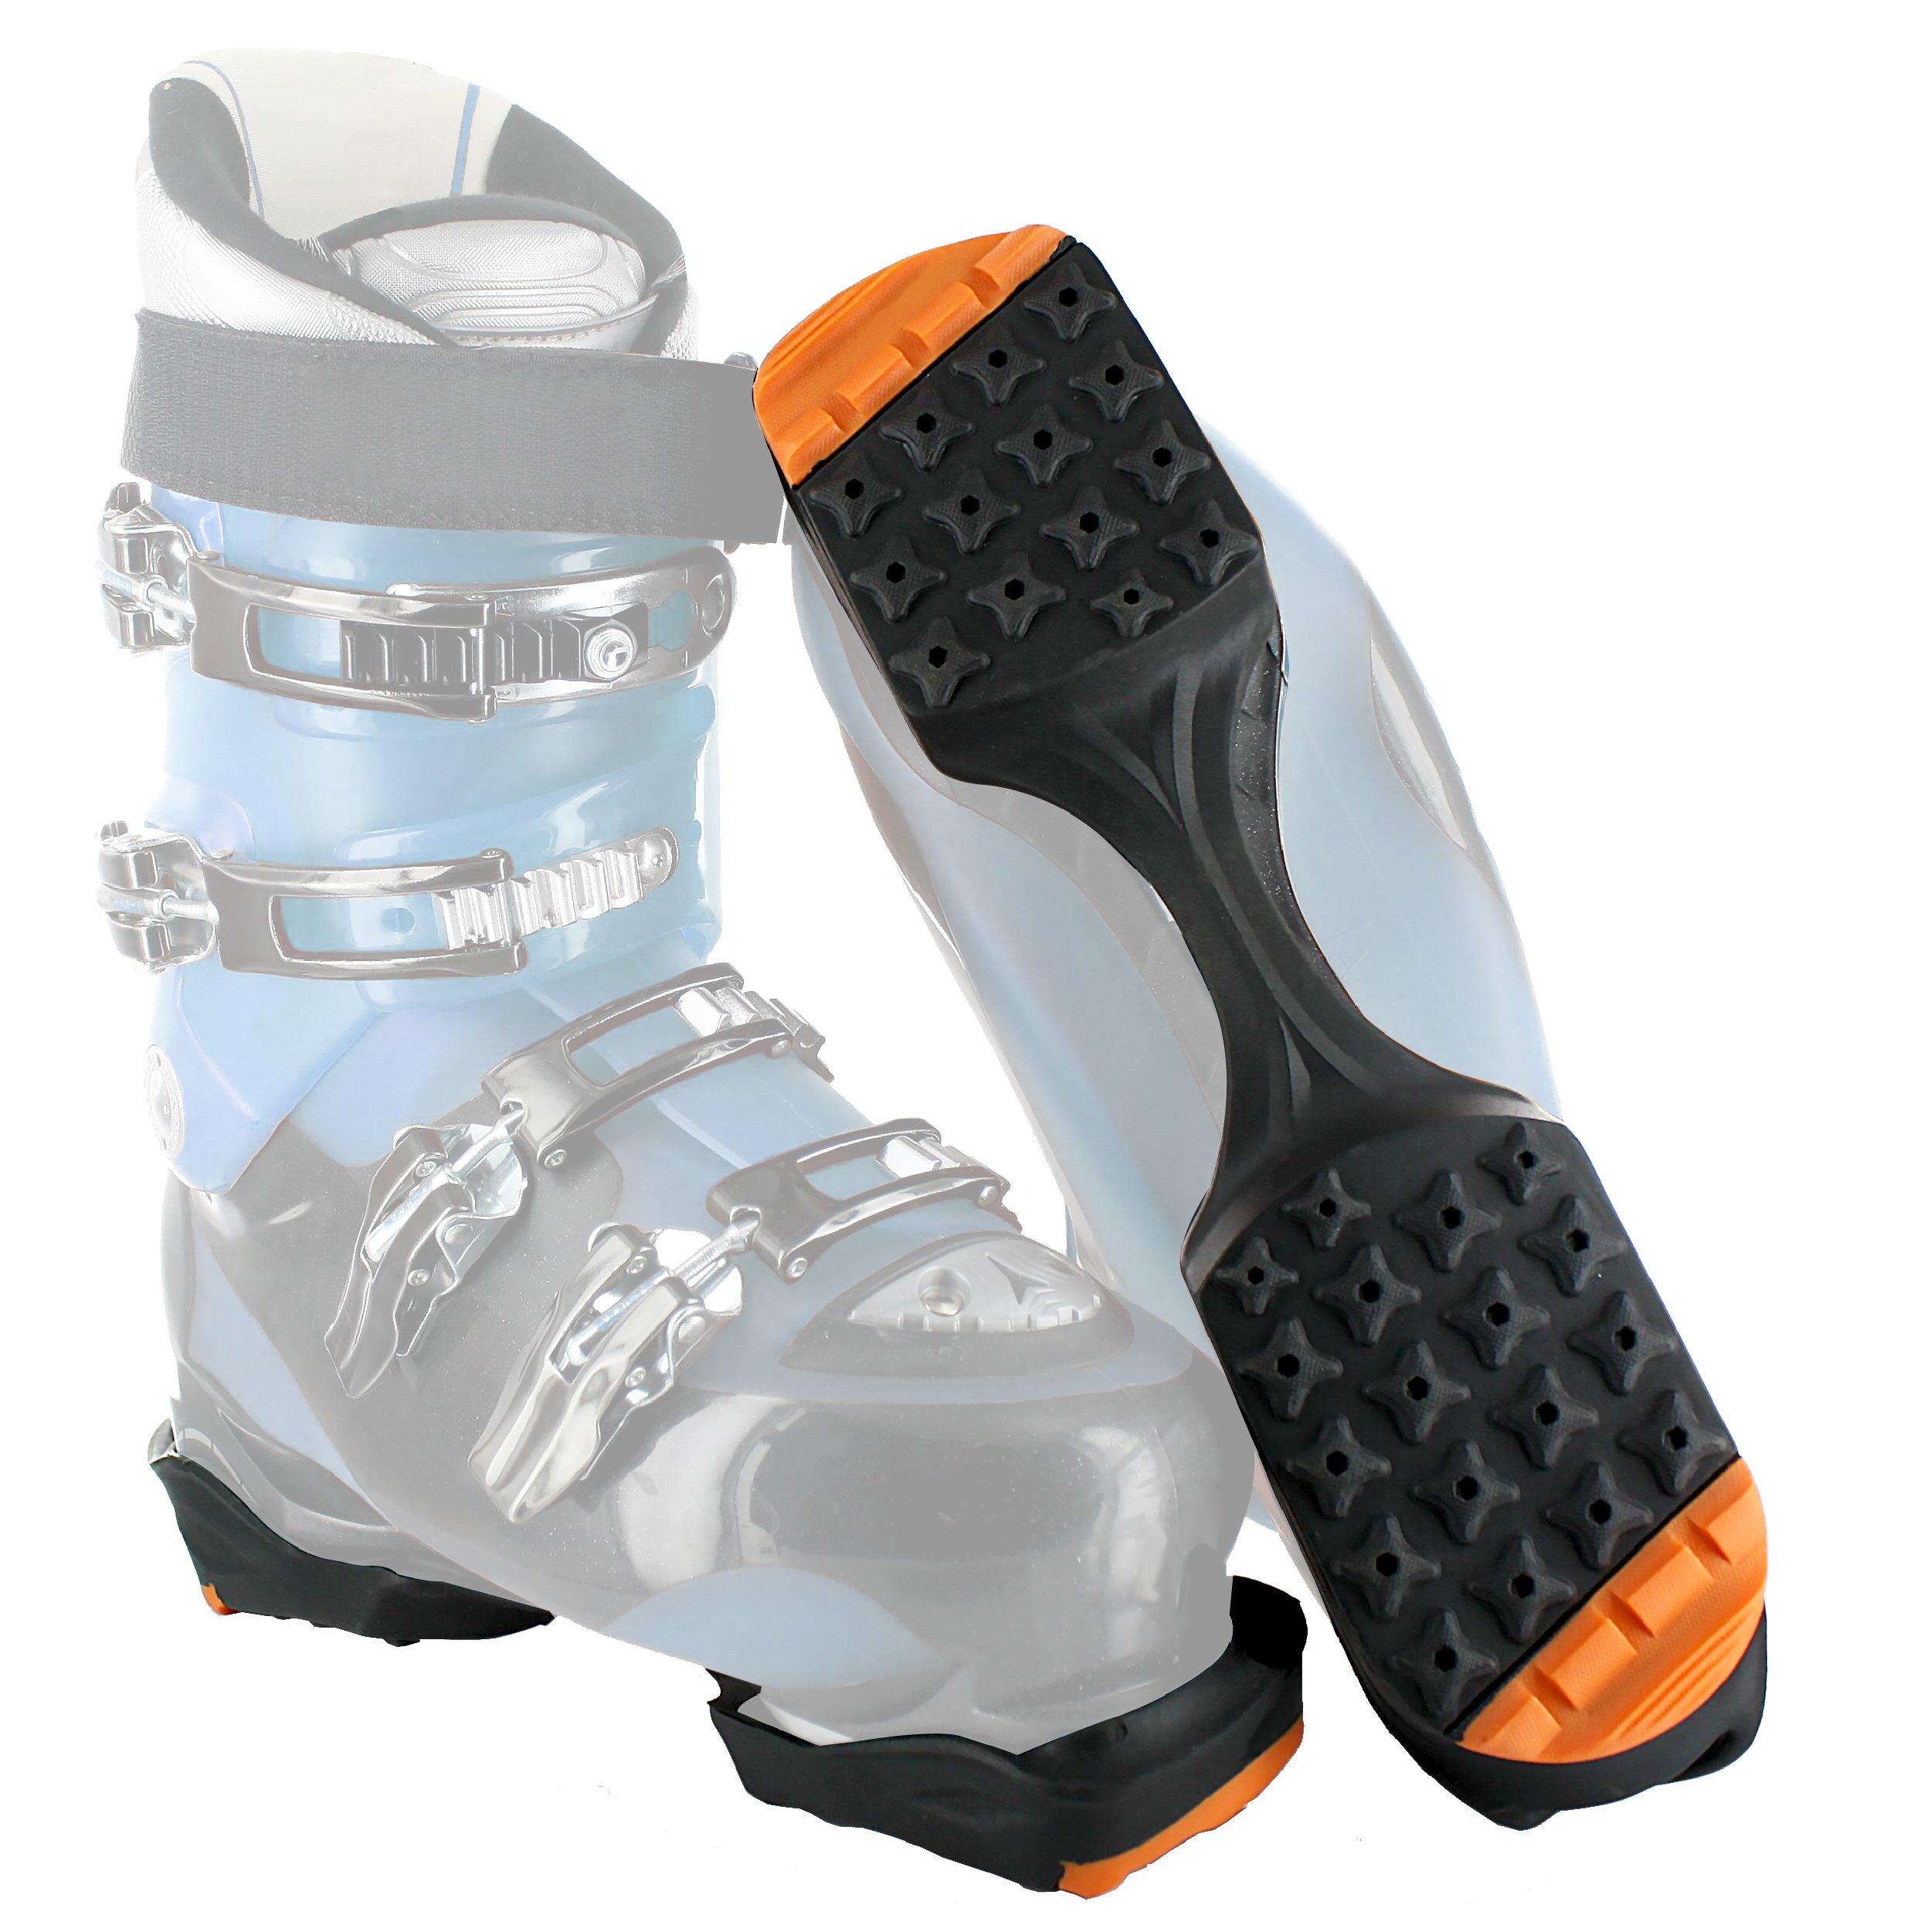 Yaktrax SkiTrax Ski Boot Tracks Traction and Protection Cleats (1 Pair), Medium by Yaktrax